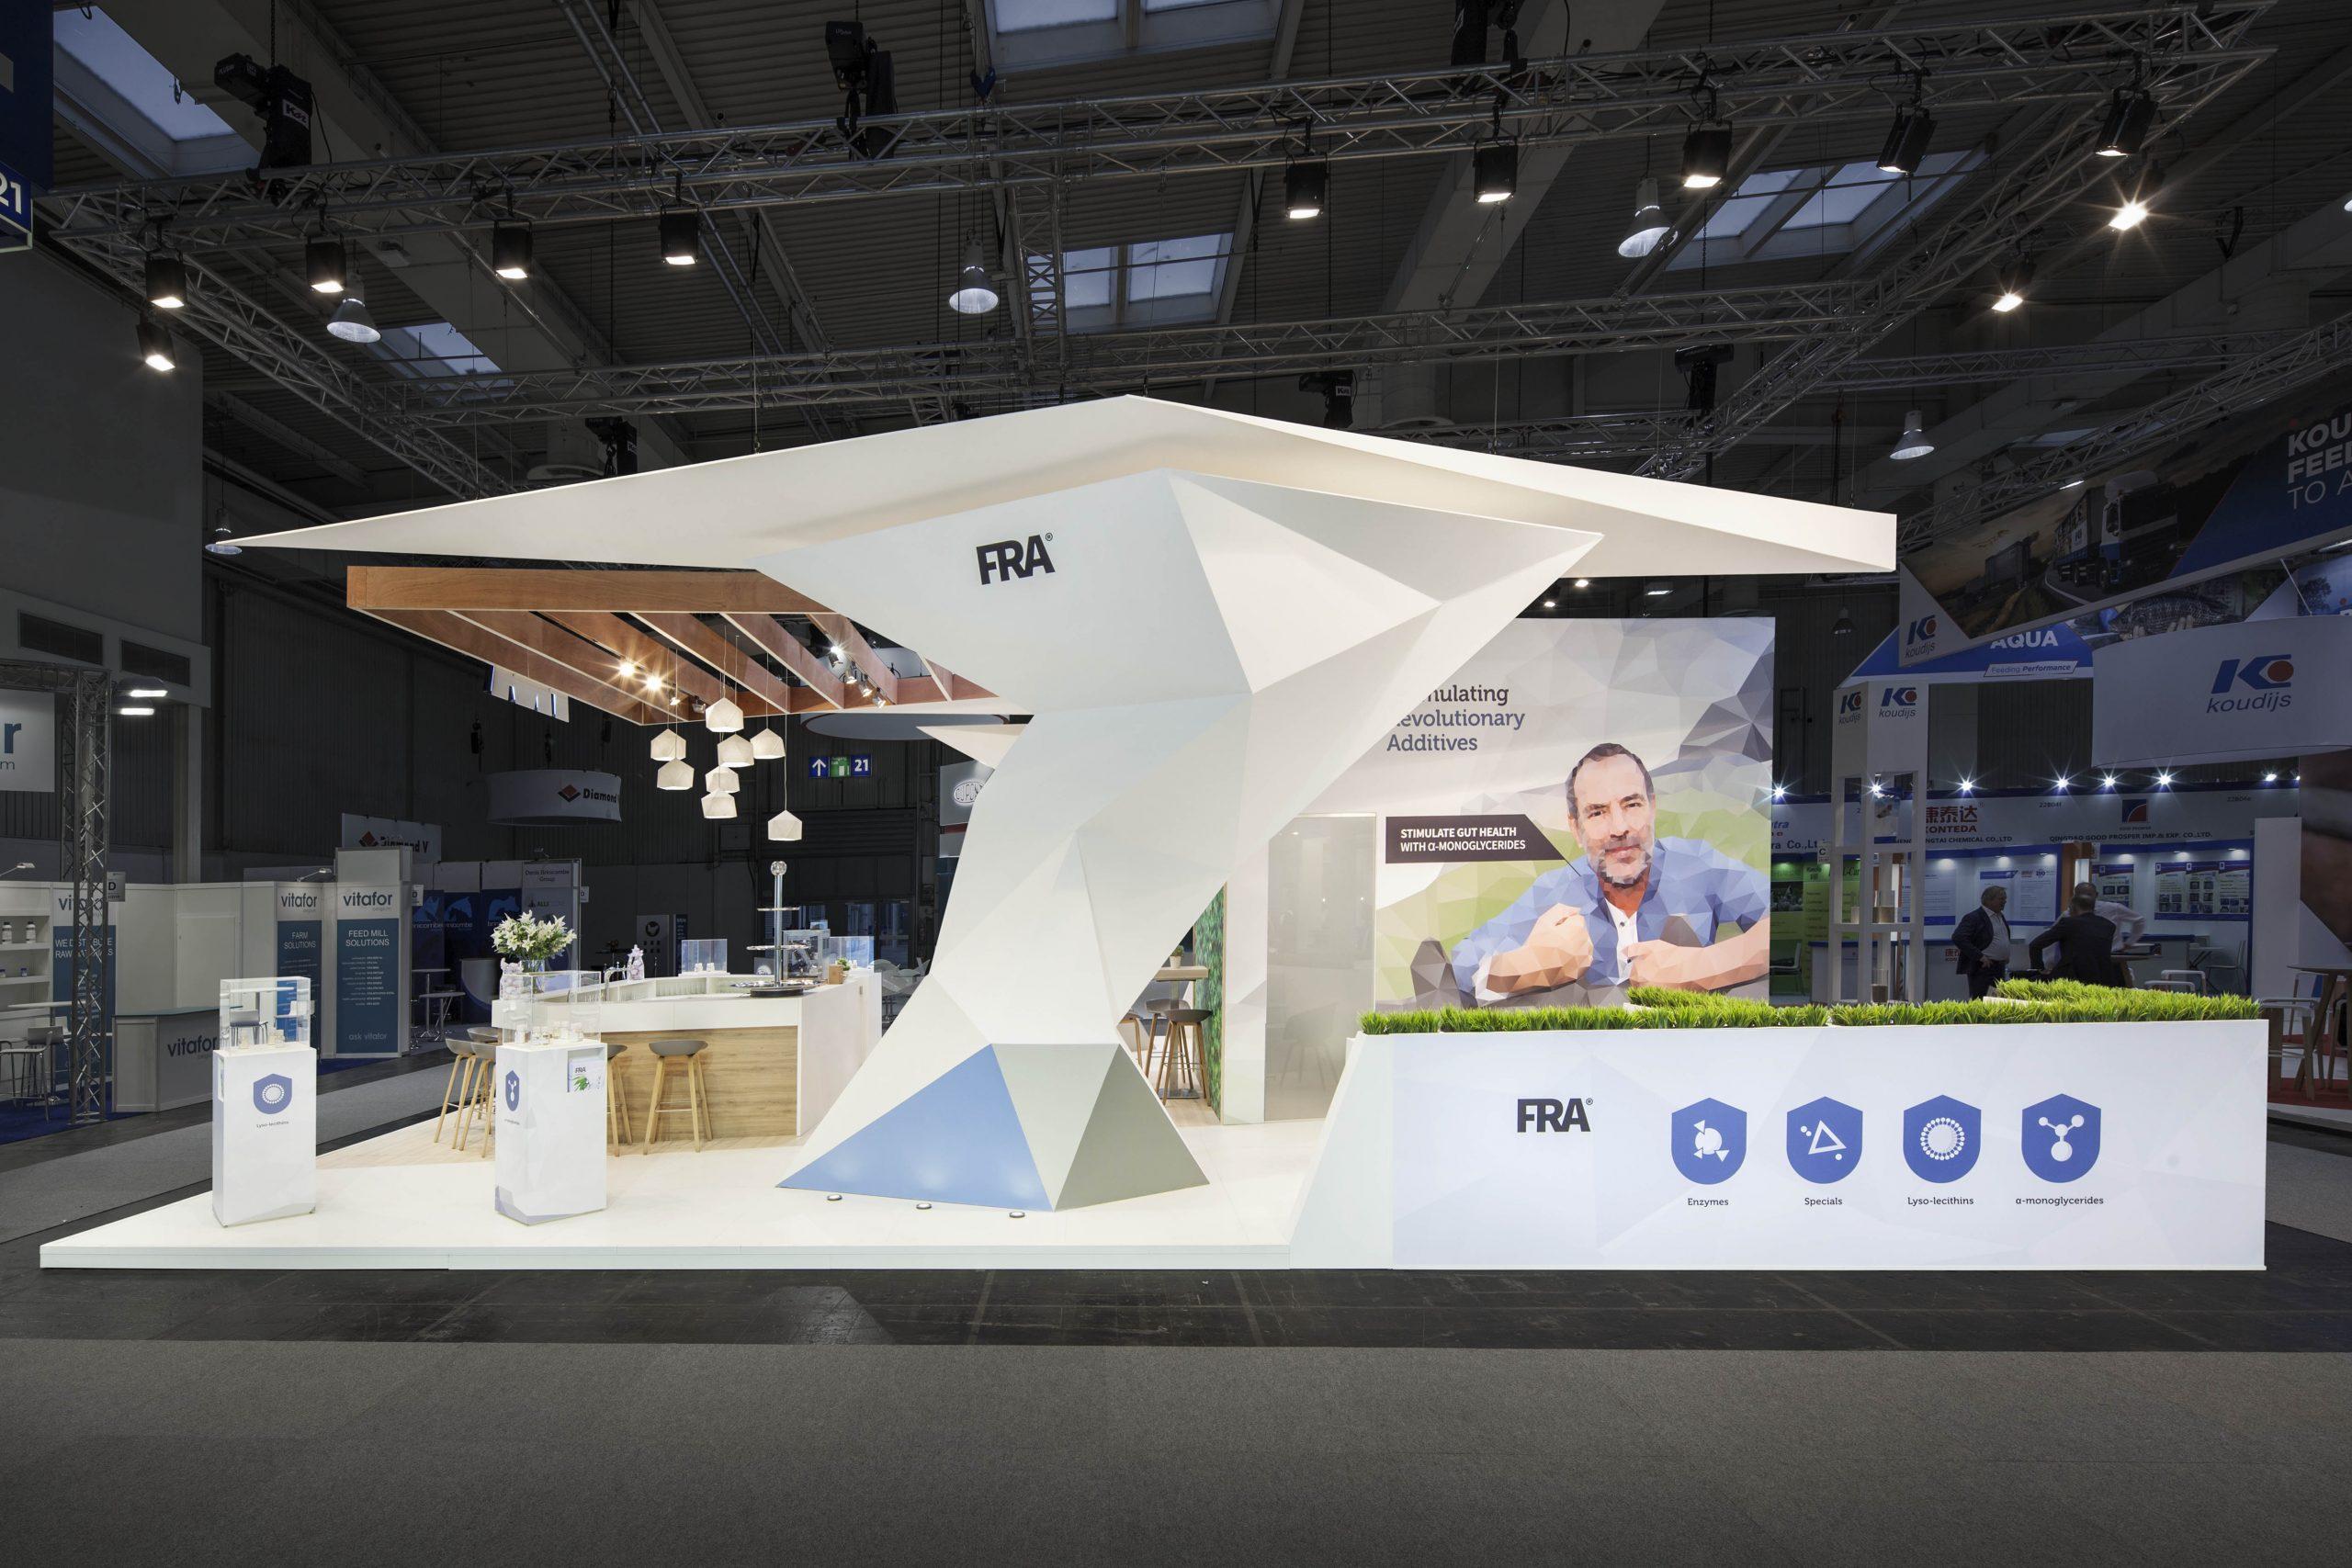 The Inside - Framelco - Eurotier 2018 - Hannover - Standbouwfotografie #1582(lr)